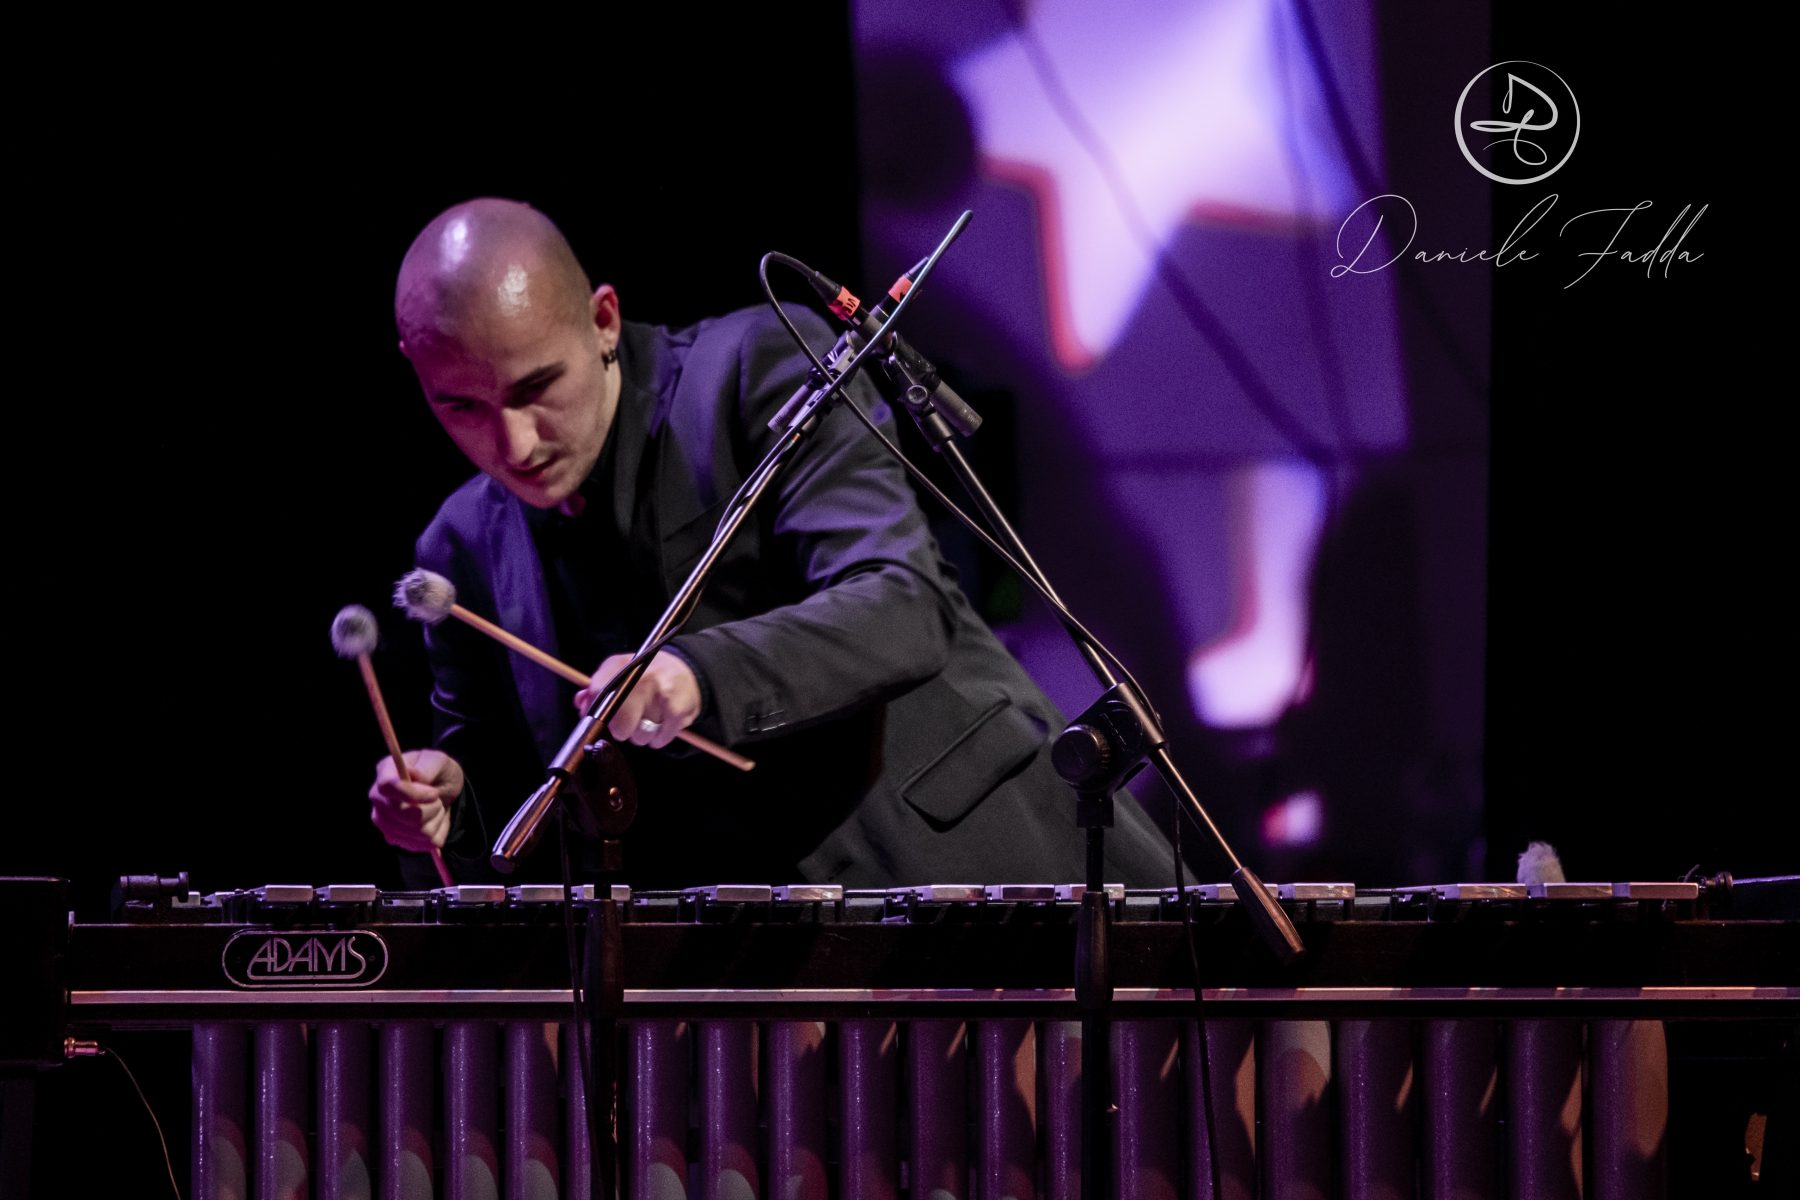 European Jazz Expo - The Italian Jazz Quartet - Daniele Fadda - 2019 - Sa Scena Sarda - 2 Novembre